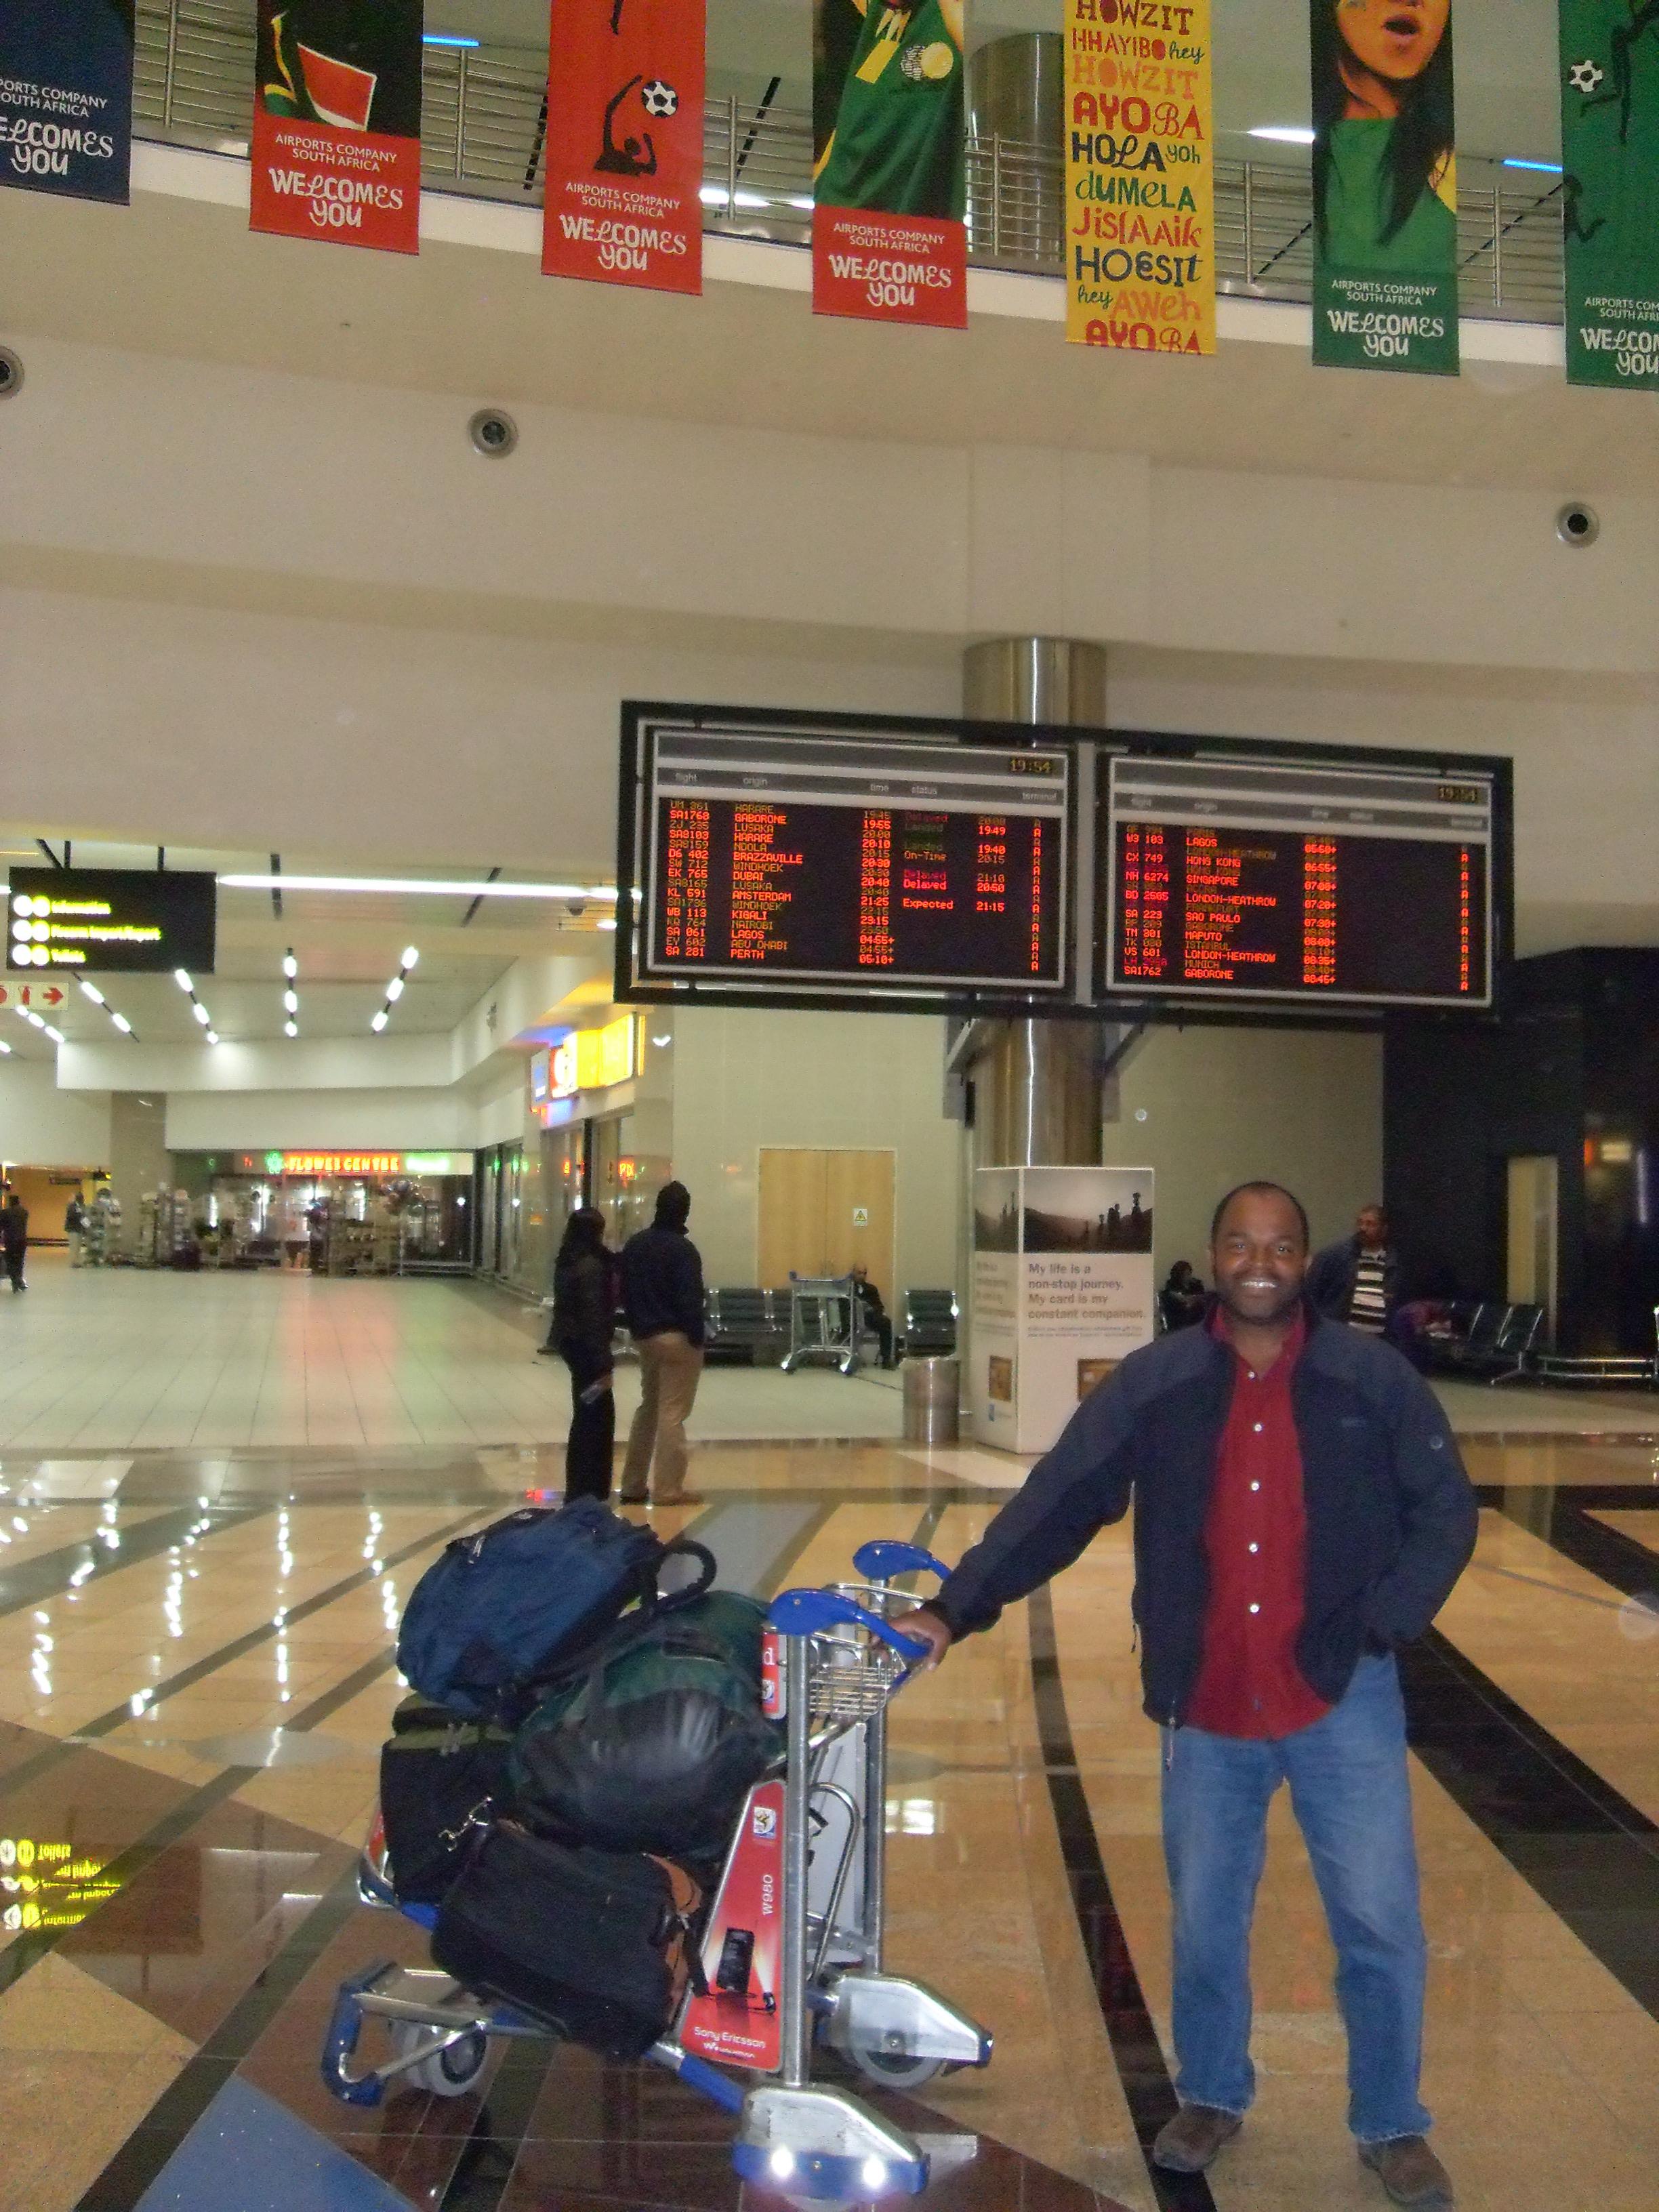 Delton arrives - Joburg Airport